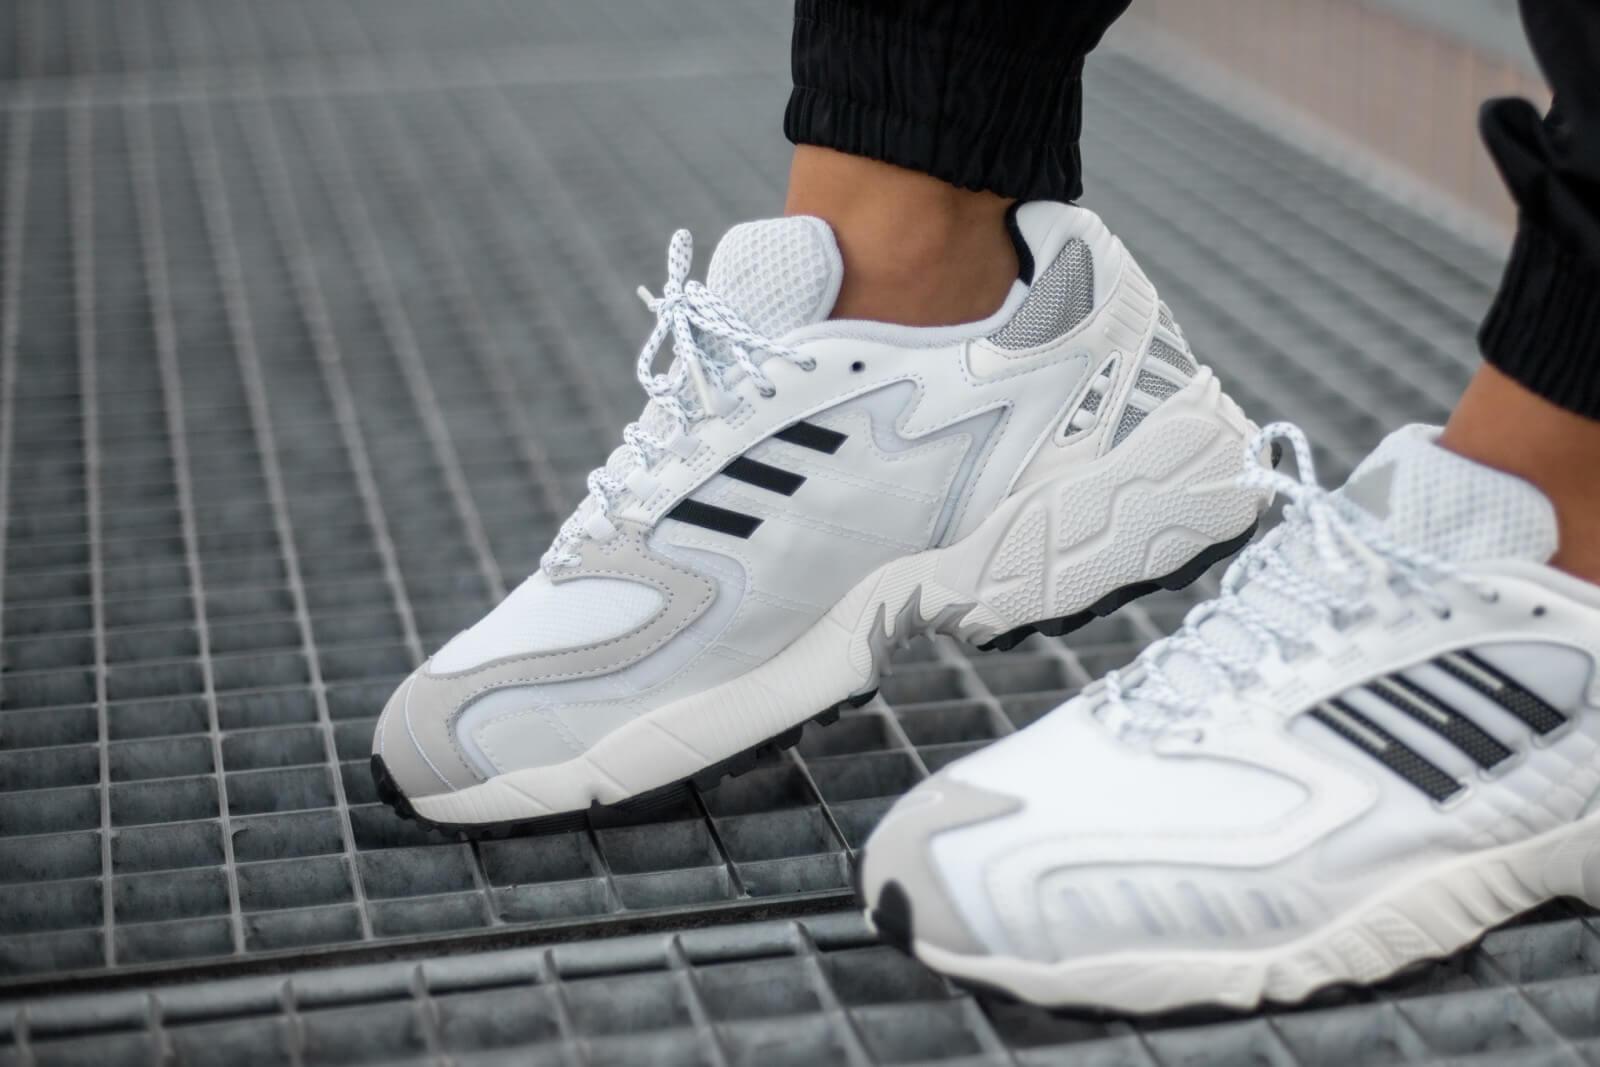 Adidas Women's Torsion TRDC Footwear